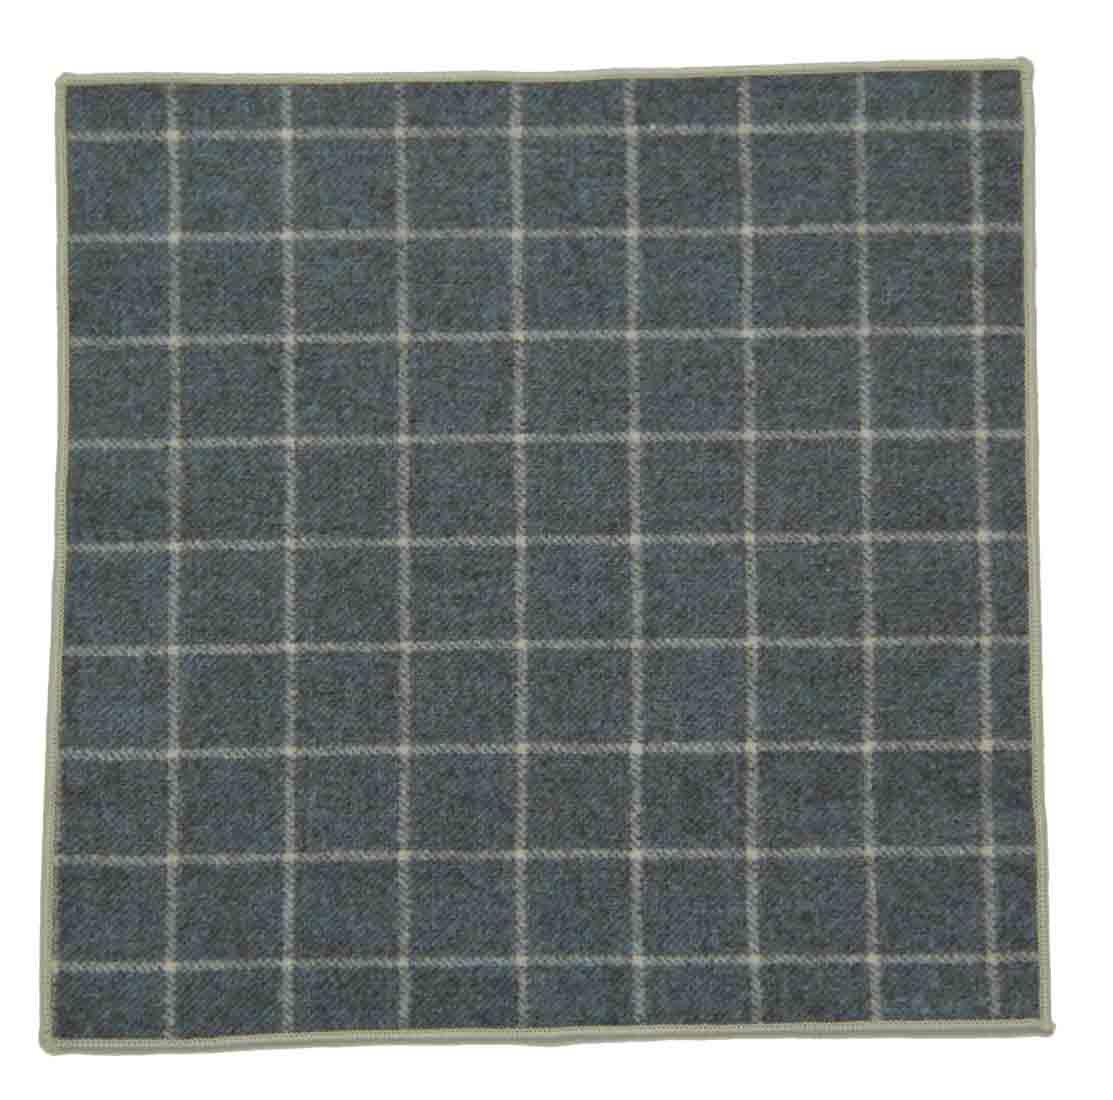 Gascoigne Wool Pocket Square Green Window Pane Check Pattern Men's